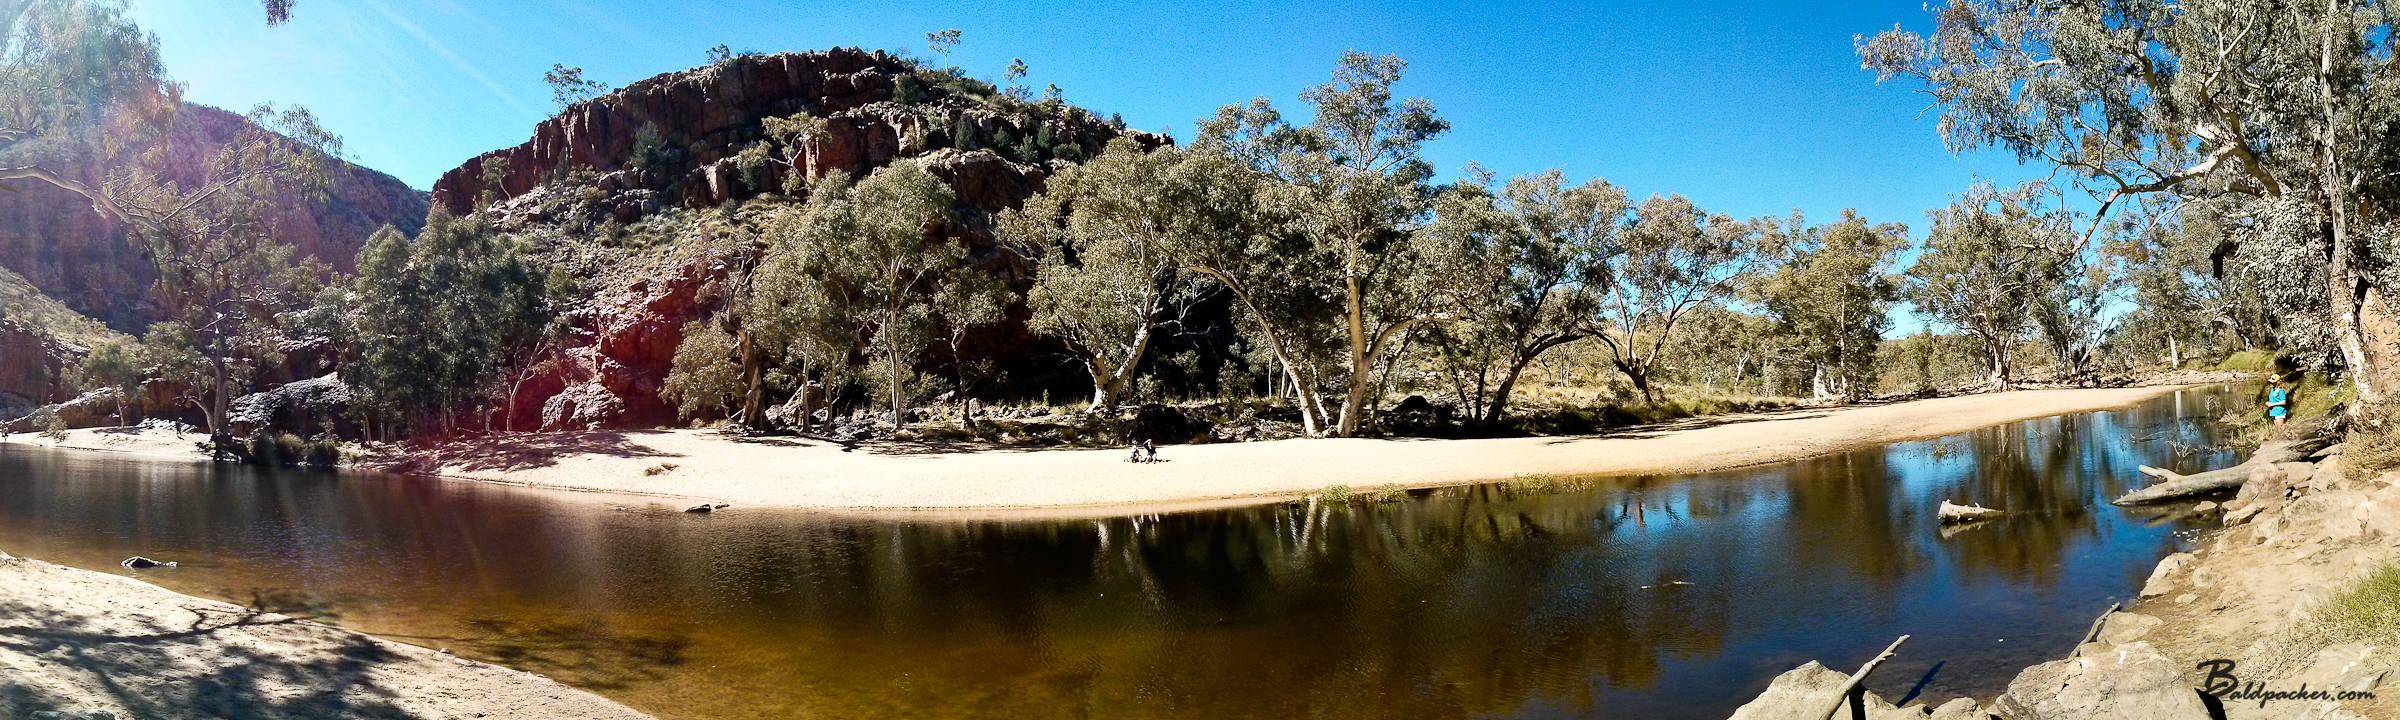 Australia: West MacDonnell Range Emu Run Tour